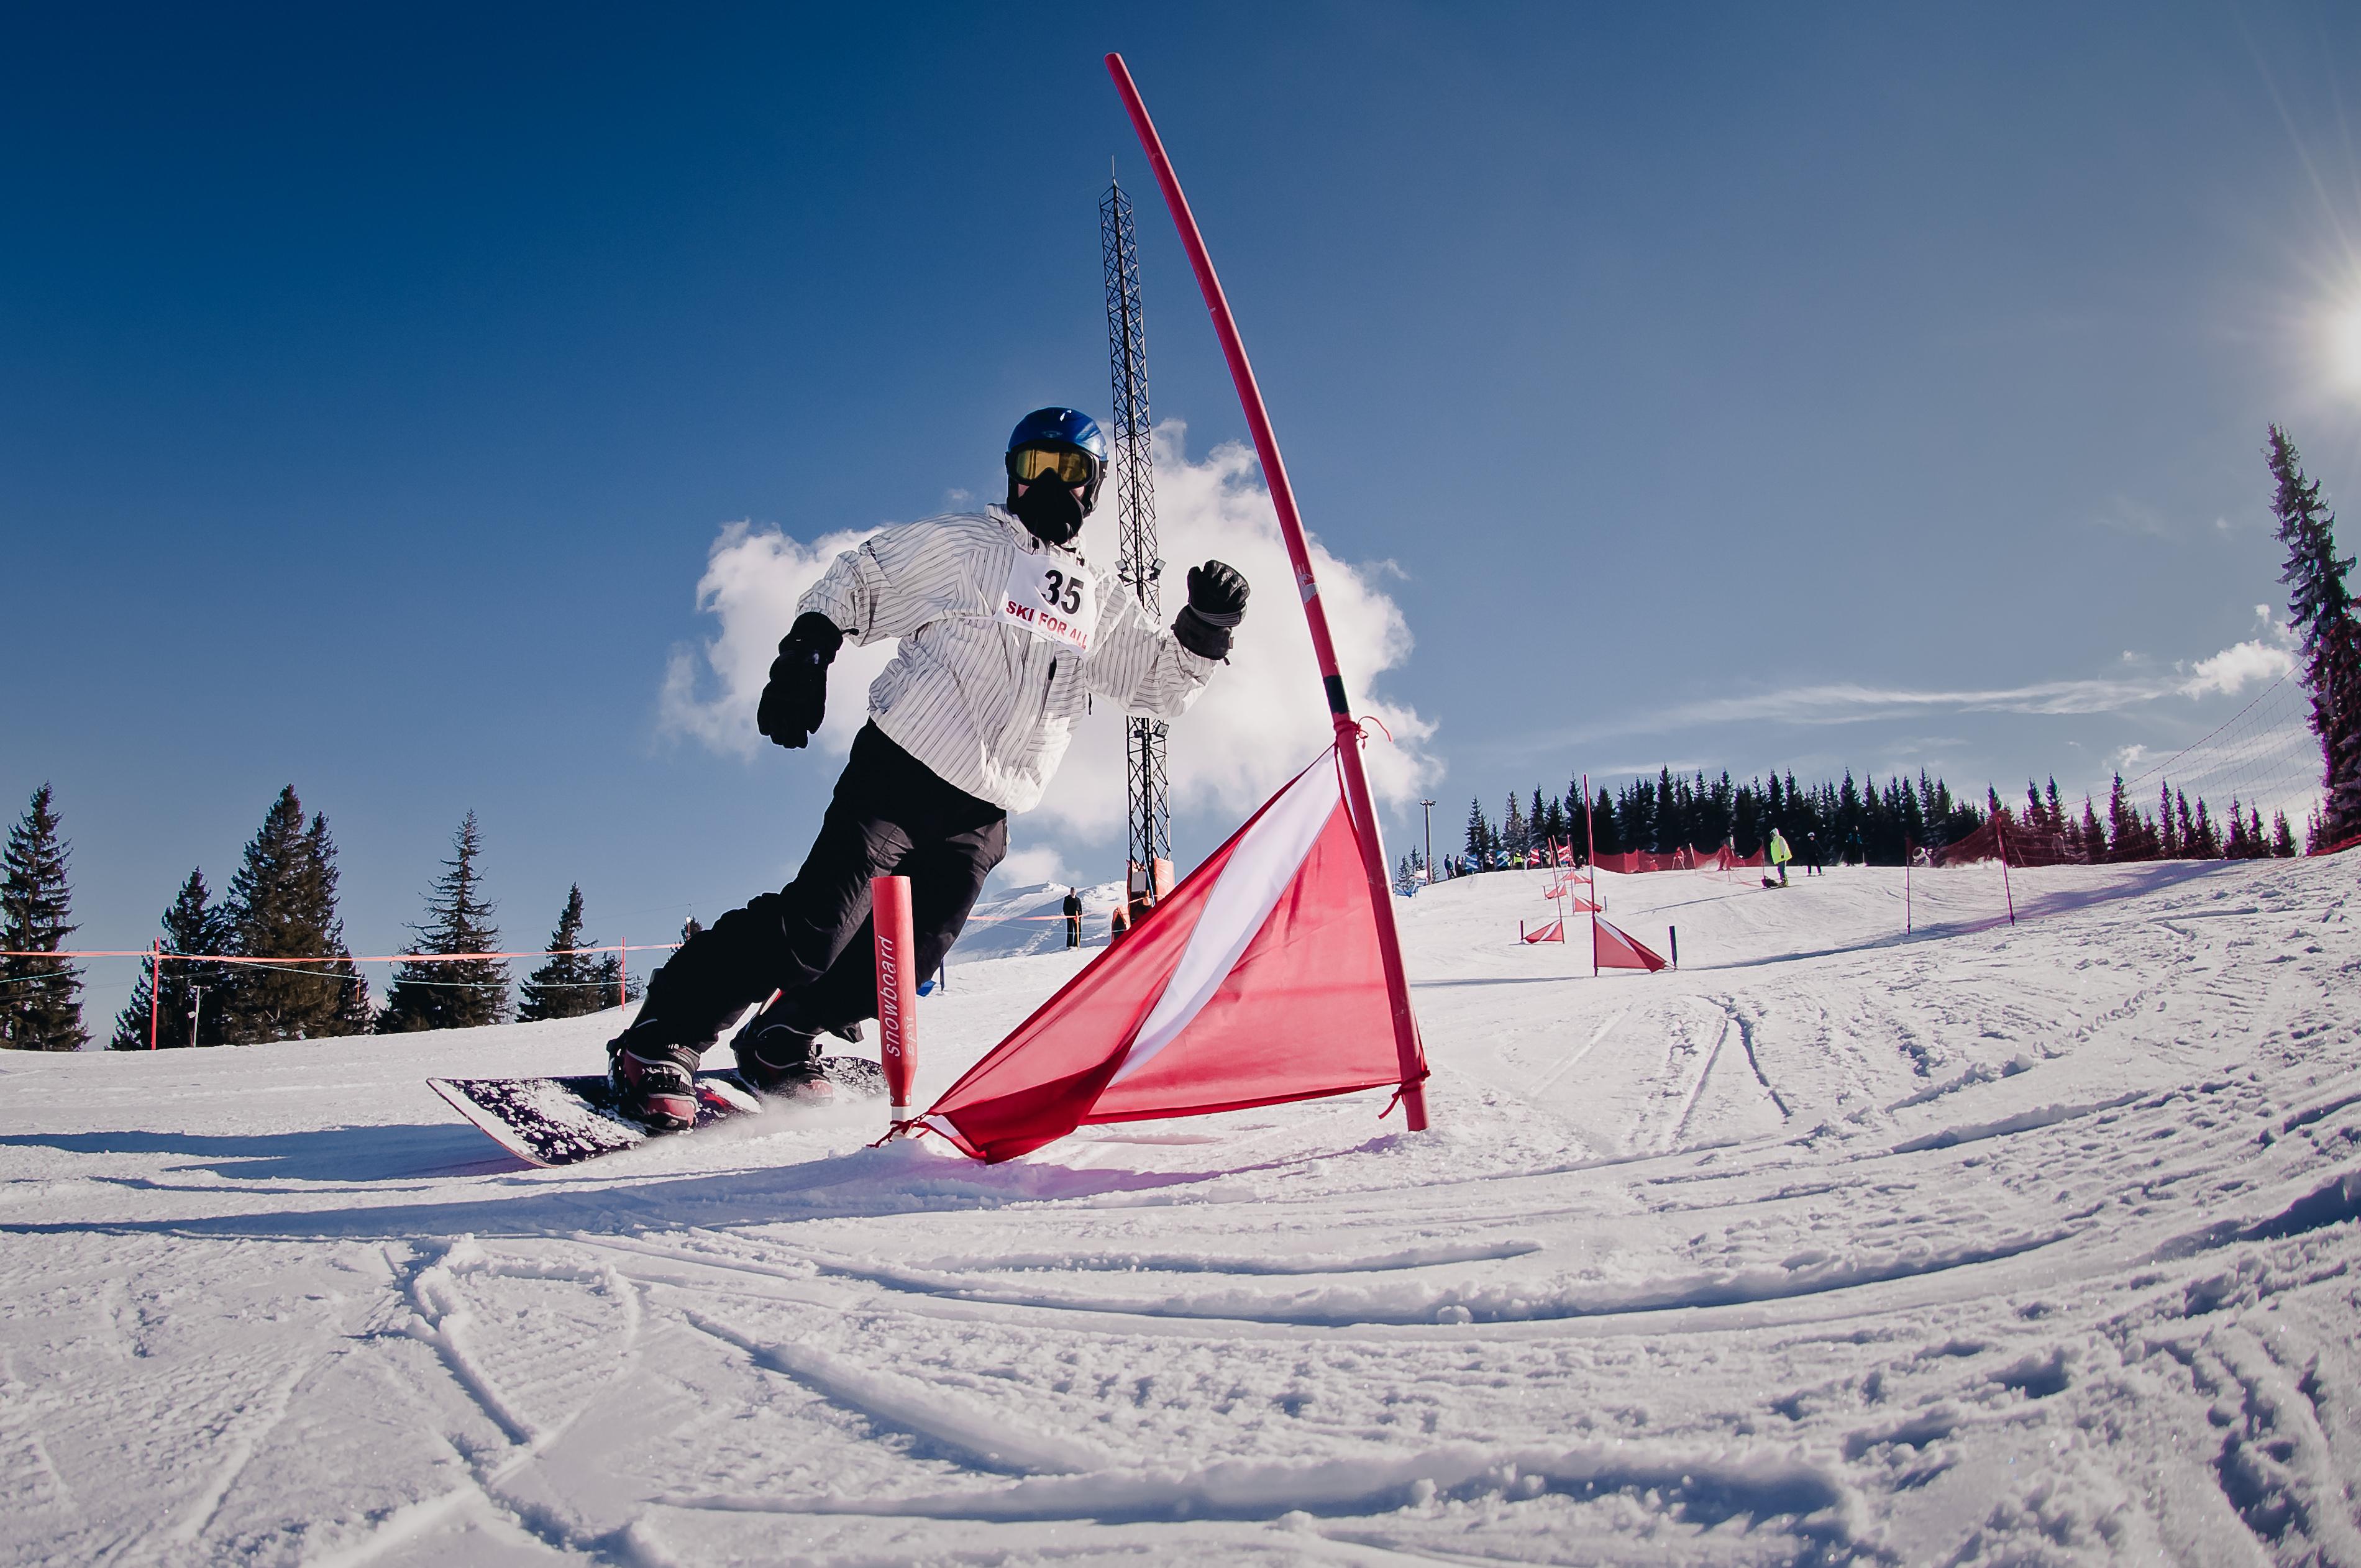 Concurs de slalom